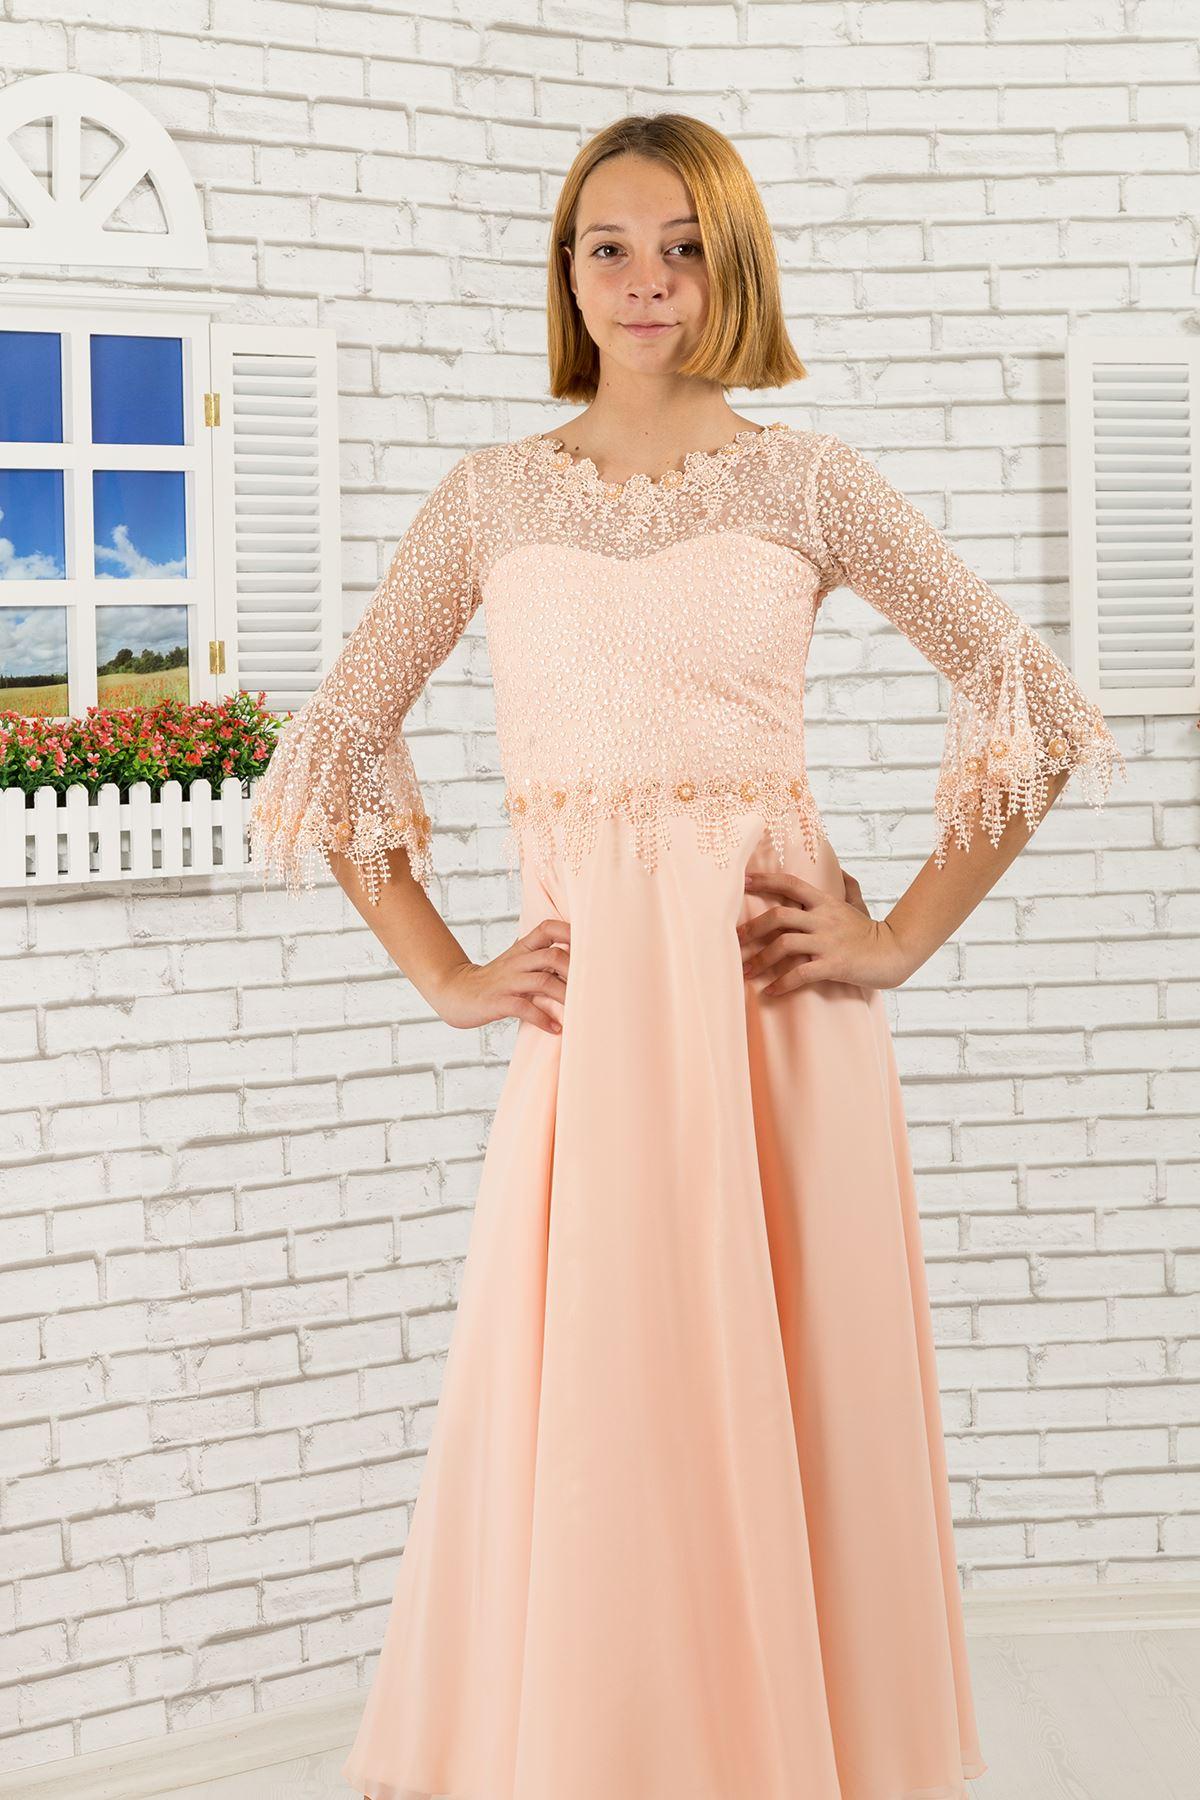 Lace Sleeve Detail, Chiffon Girl Evening Dress 464 Salmon